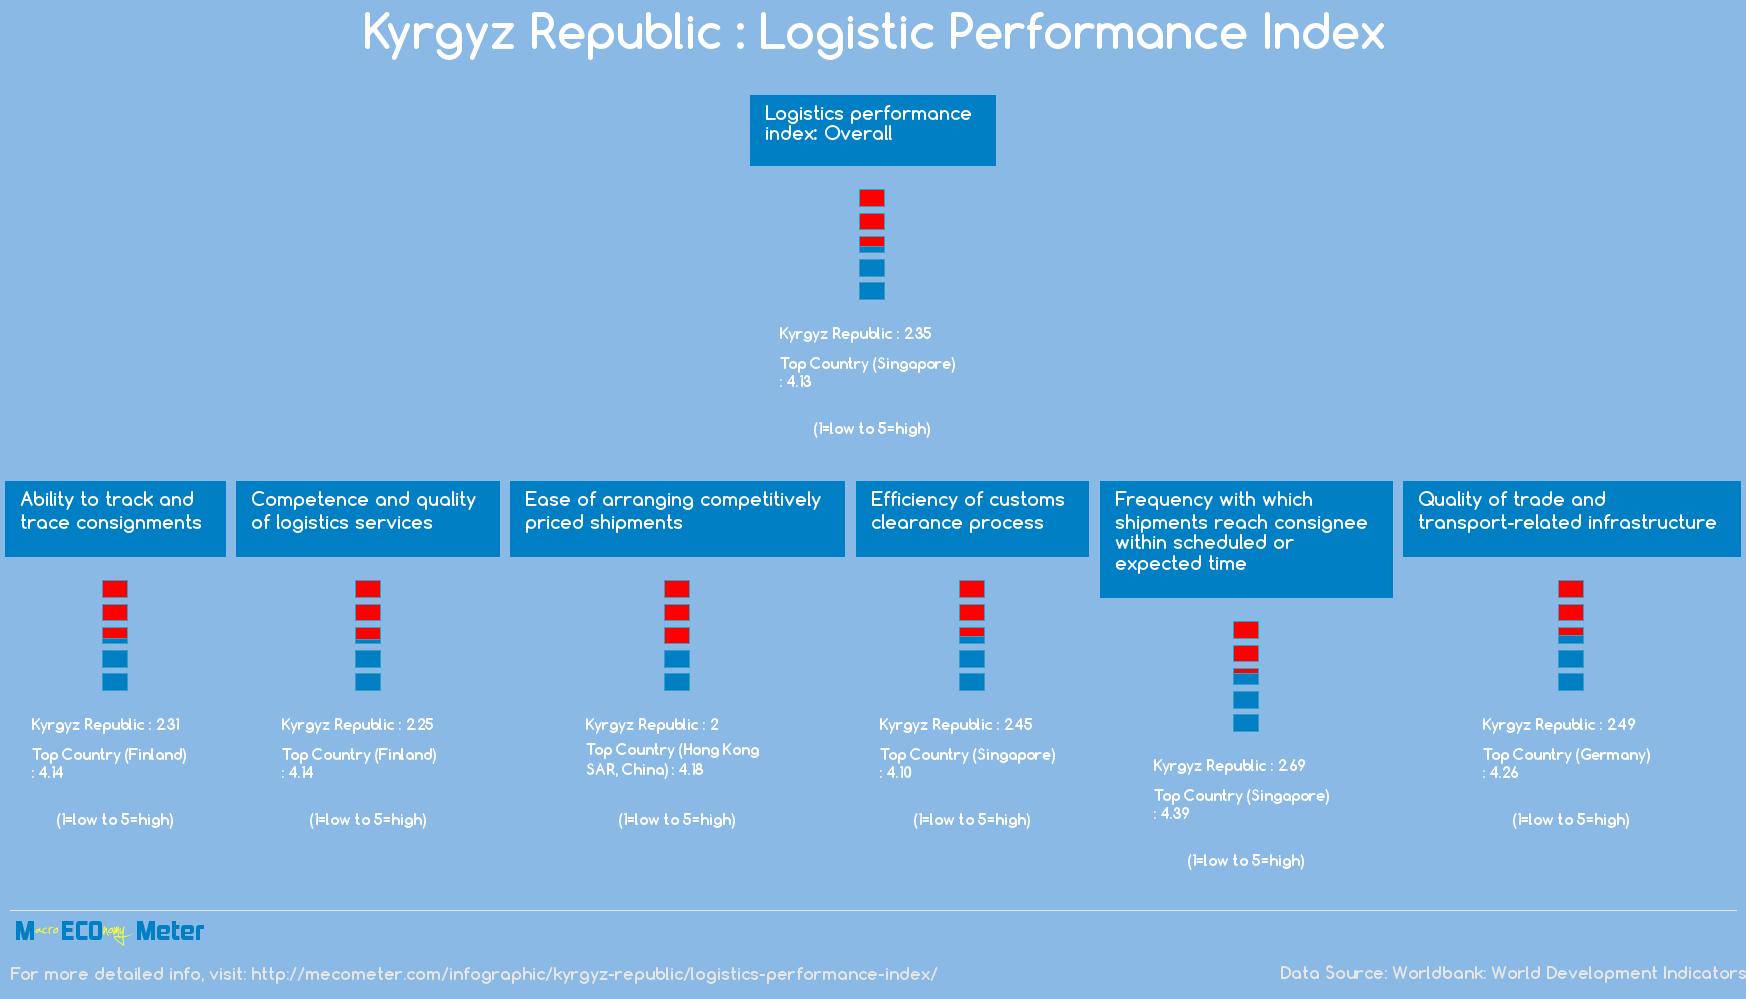 Kyrgyz Republic : Logistic Performance Index